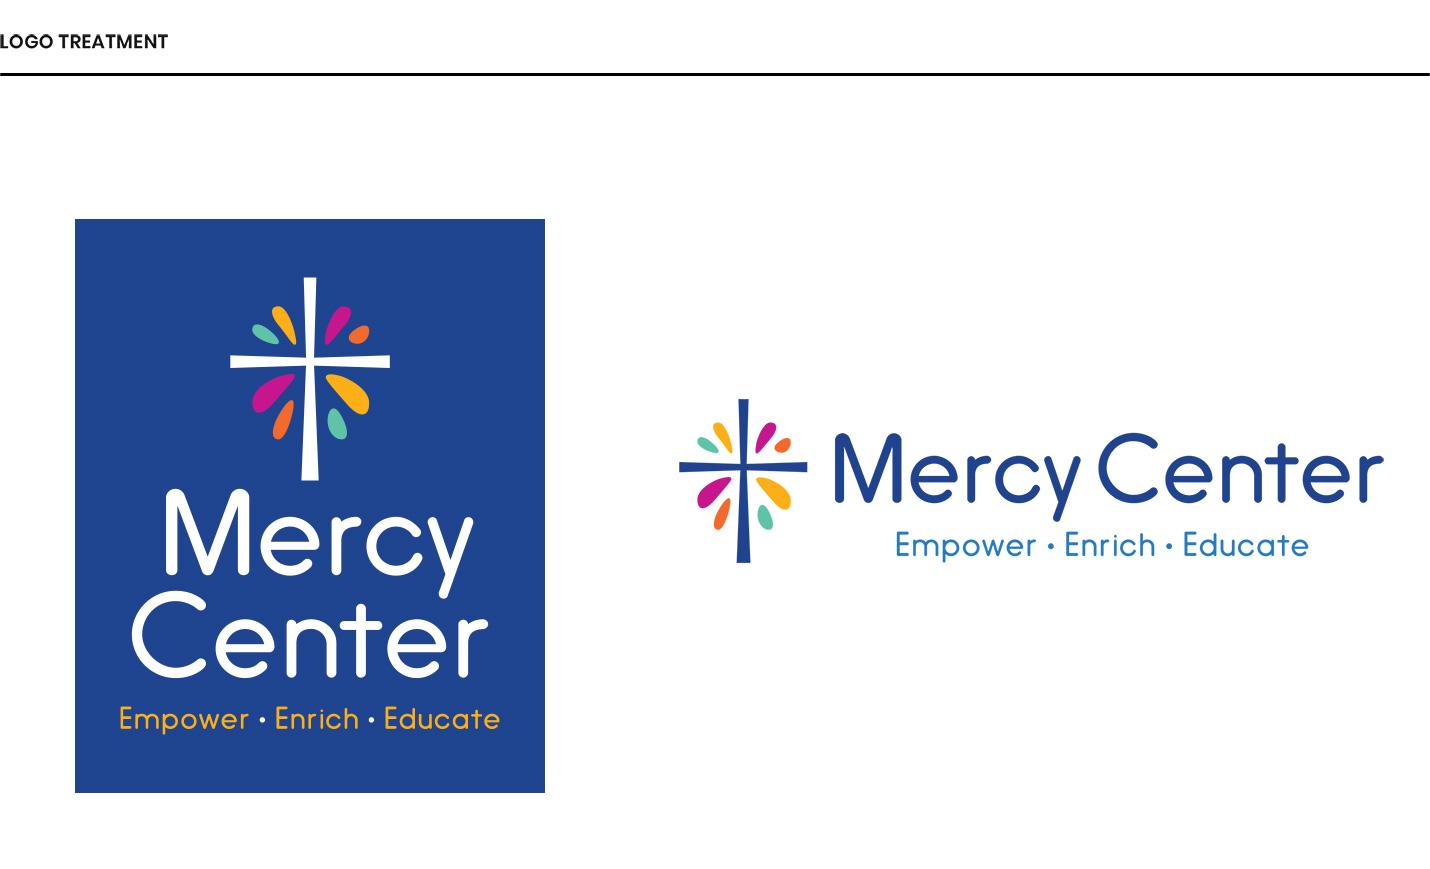 Mercy Center